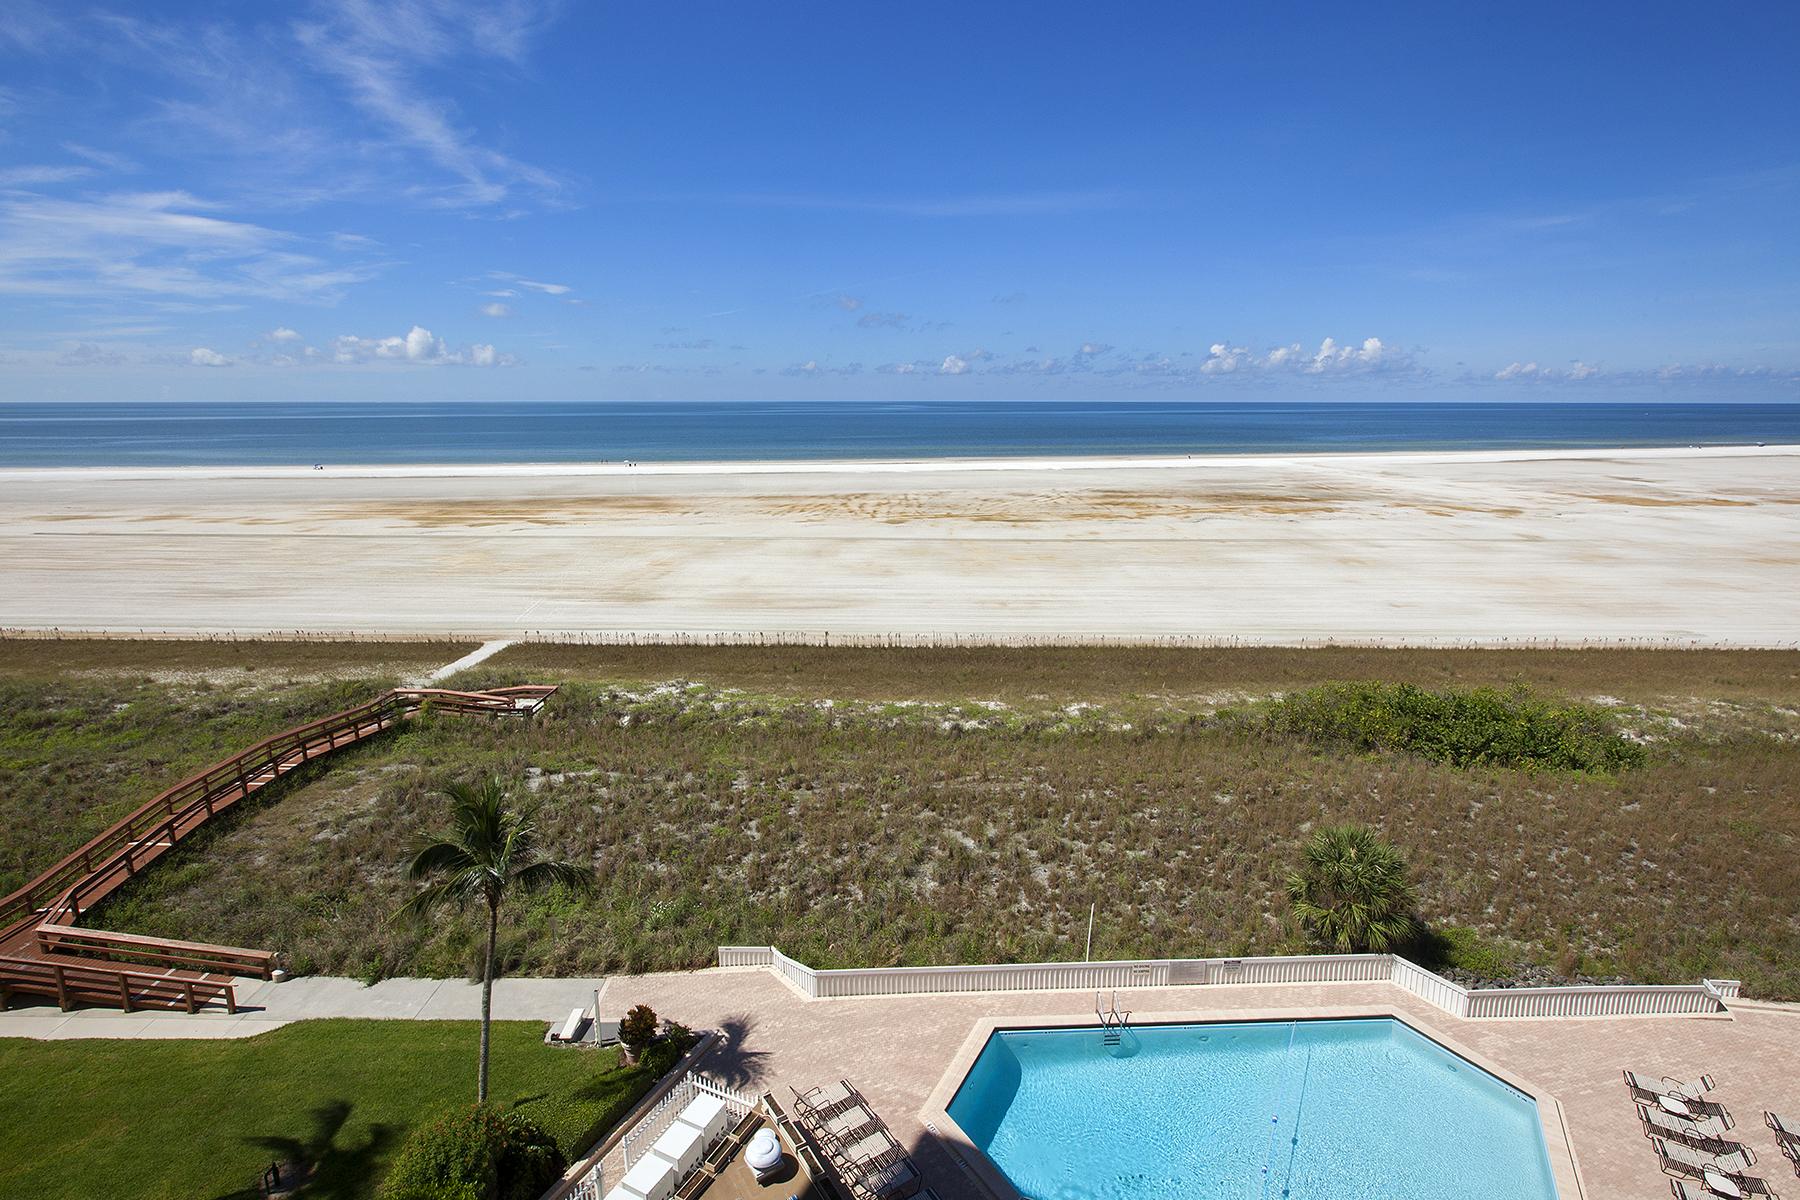 共管物業 為 出售 在 MARCO ISLAND - TRADEWINDS 180 Seaview Ct 703 Marco Island, 佛羅里達州, 34145 美國